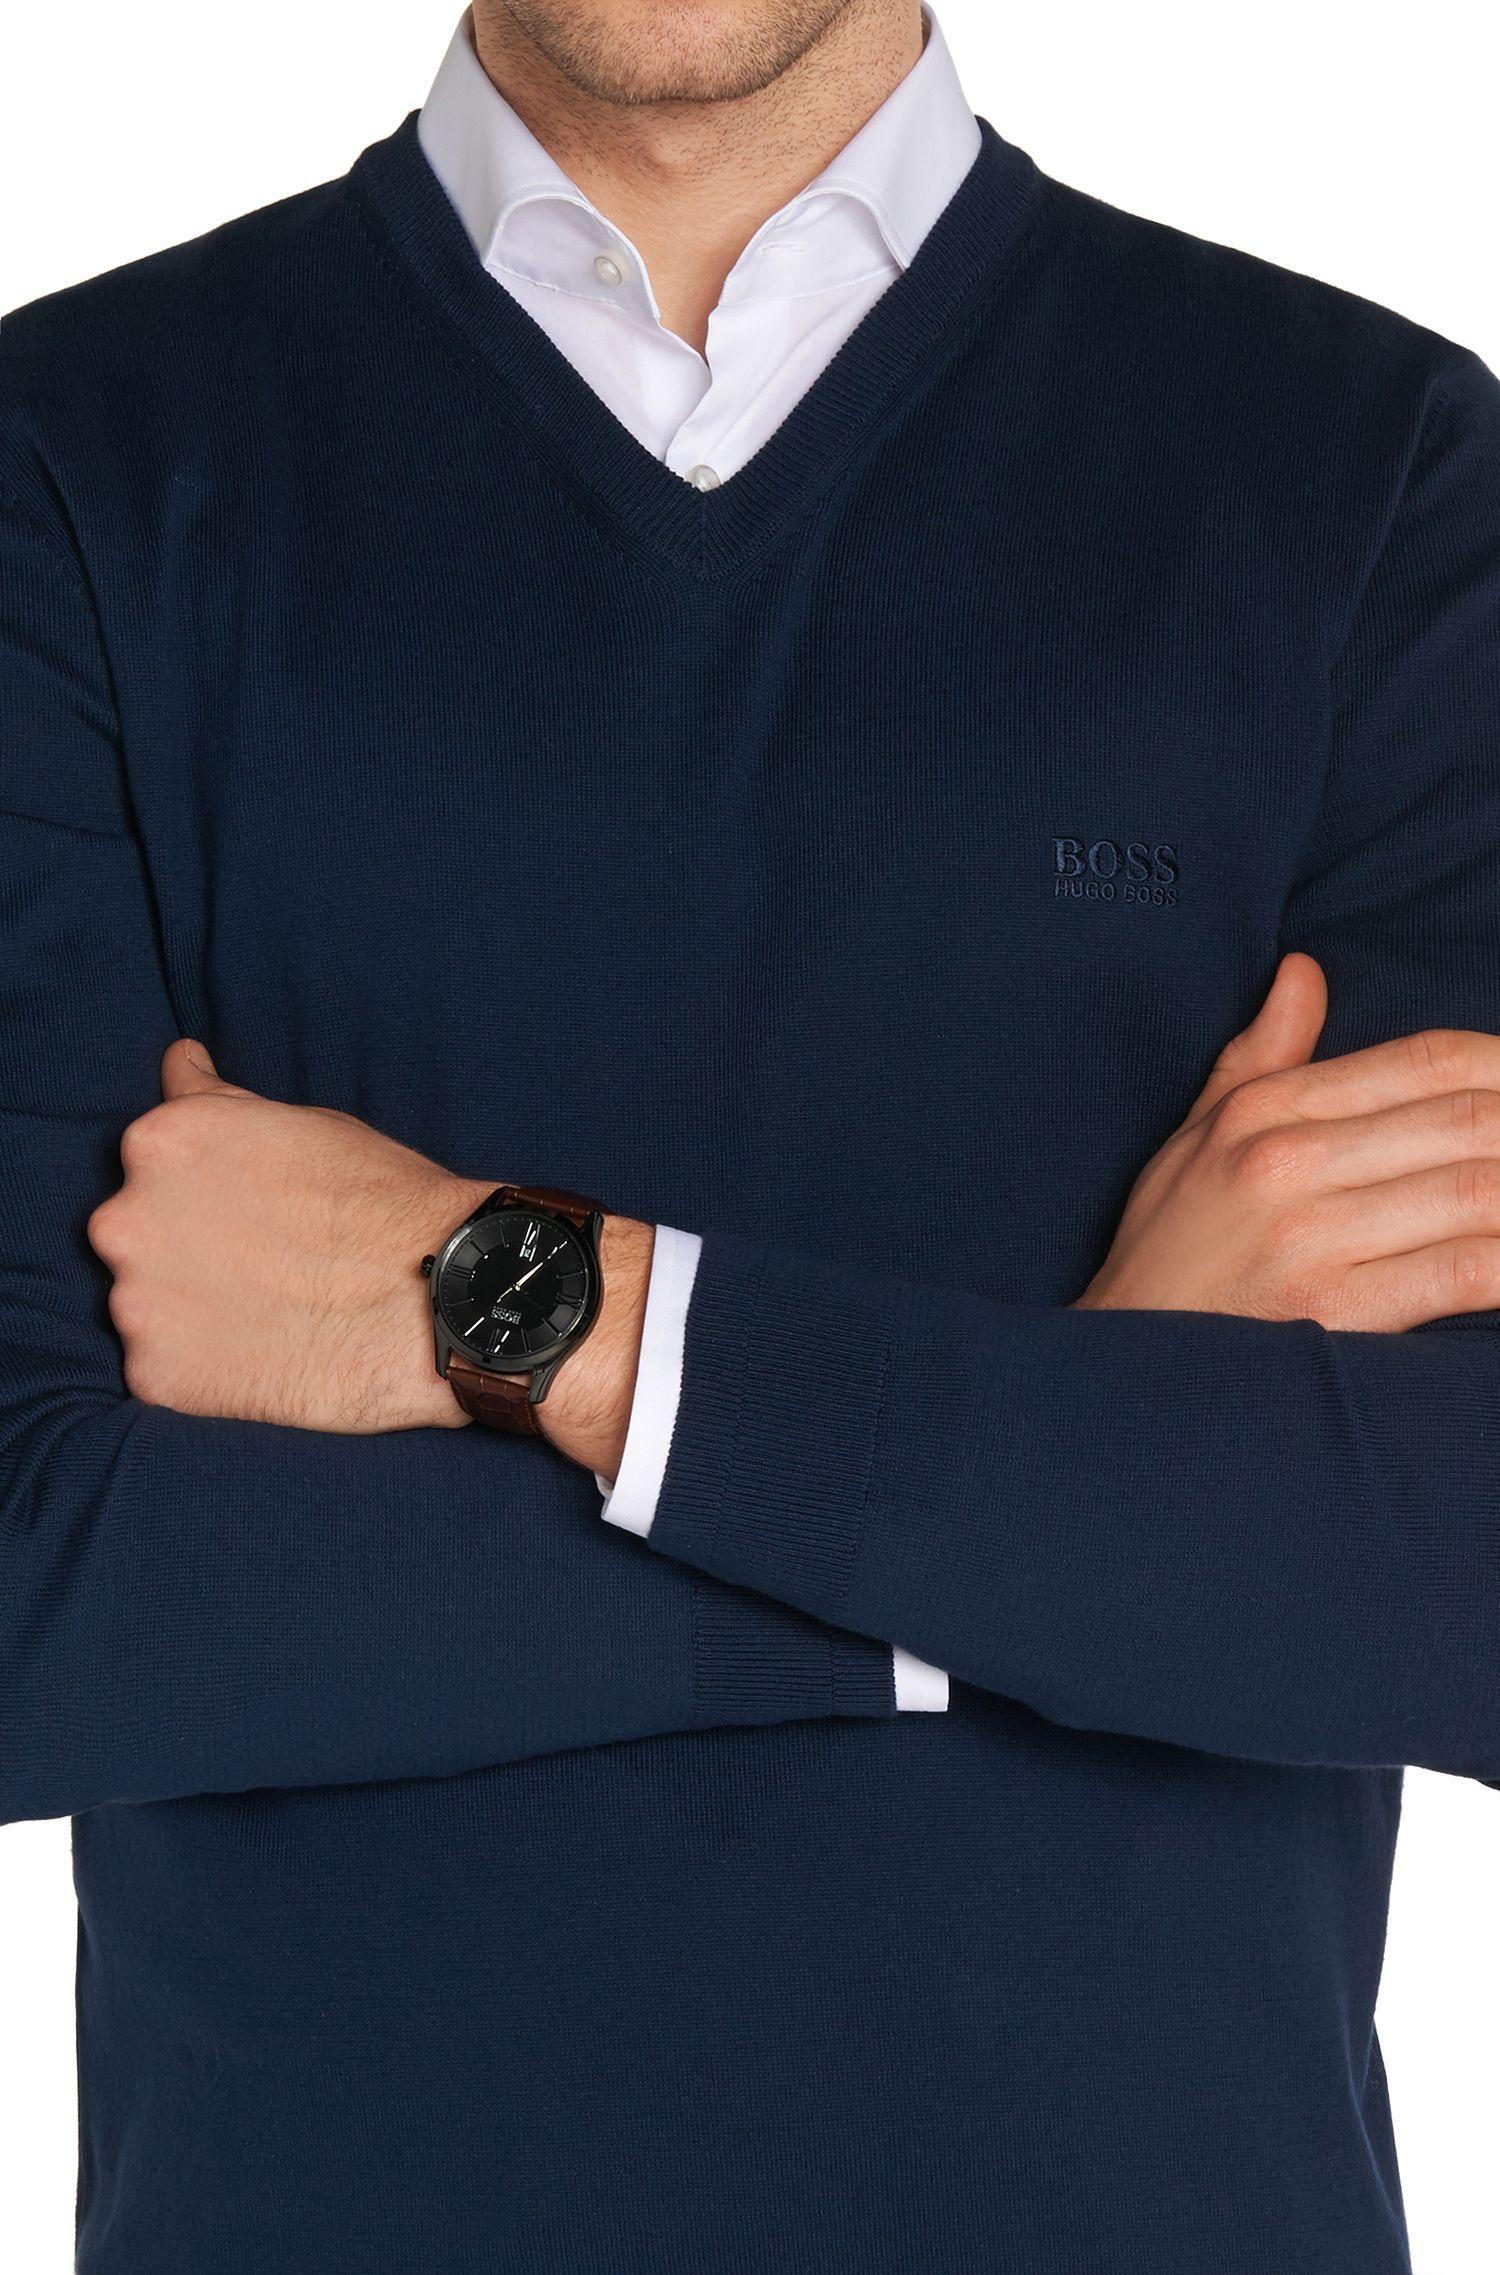 Montre-bracelet «HB6038» avec boîtier en acier inoxydable